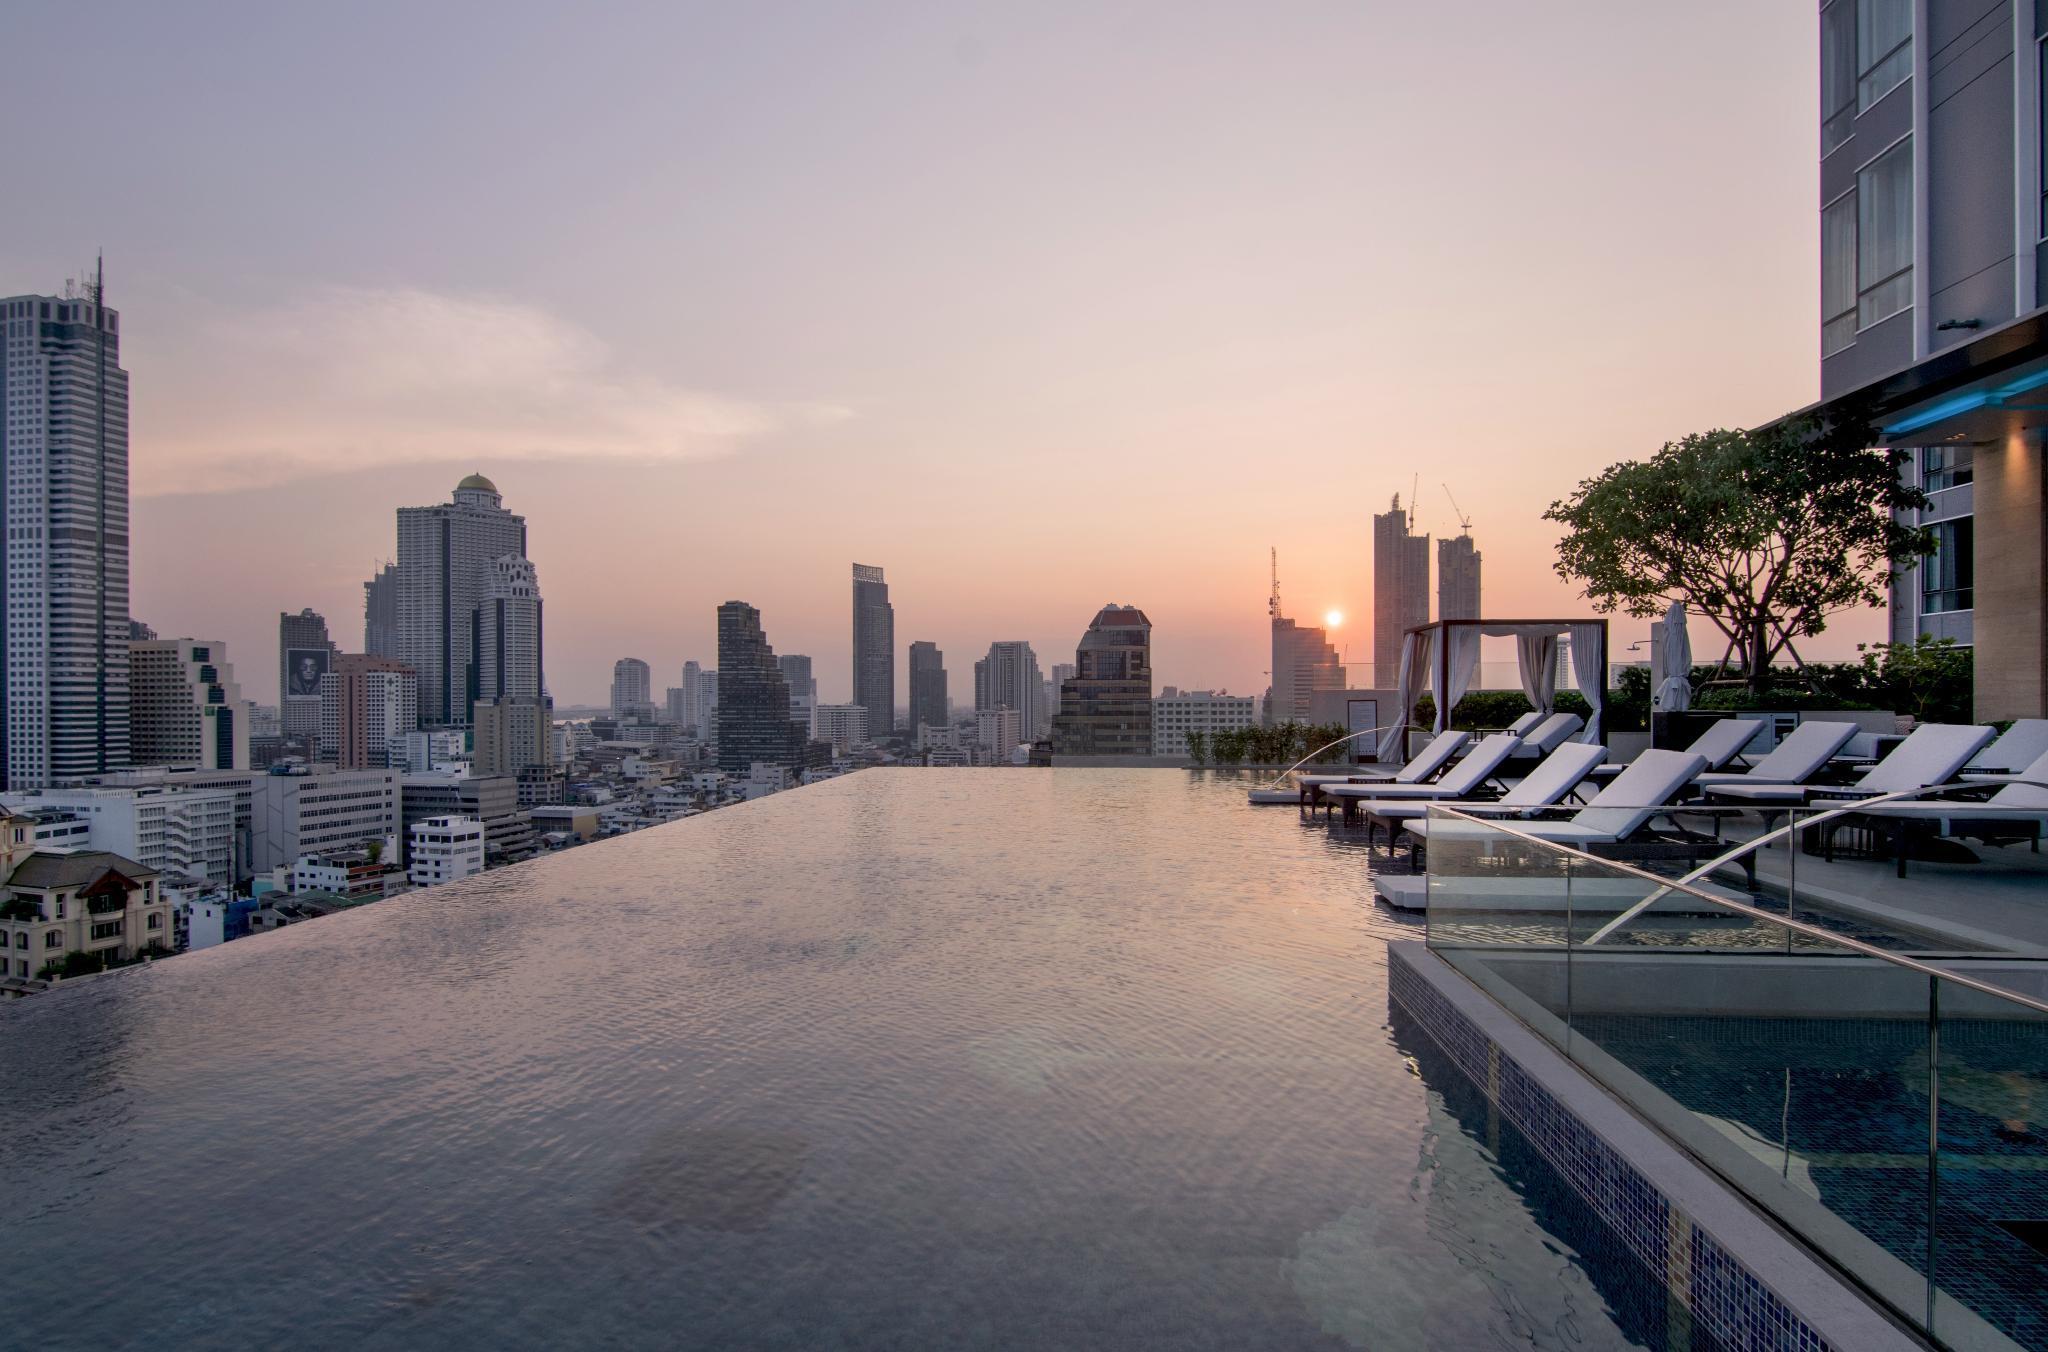 Bangkok Marriott Hotel The Surawongse - Bangkok